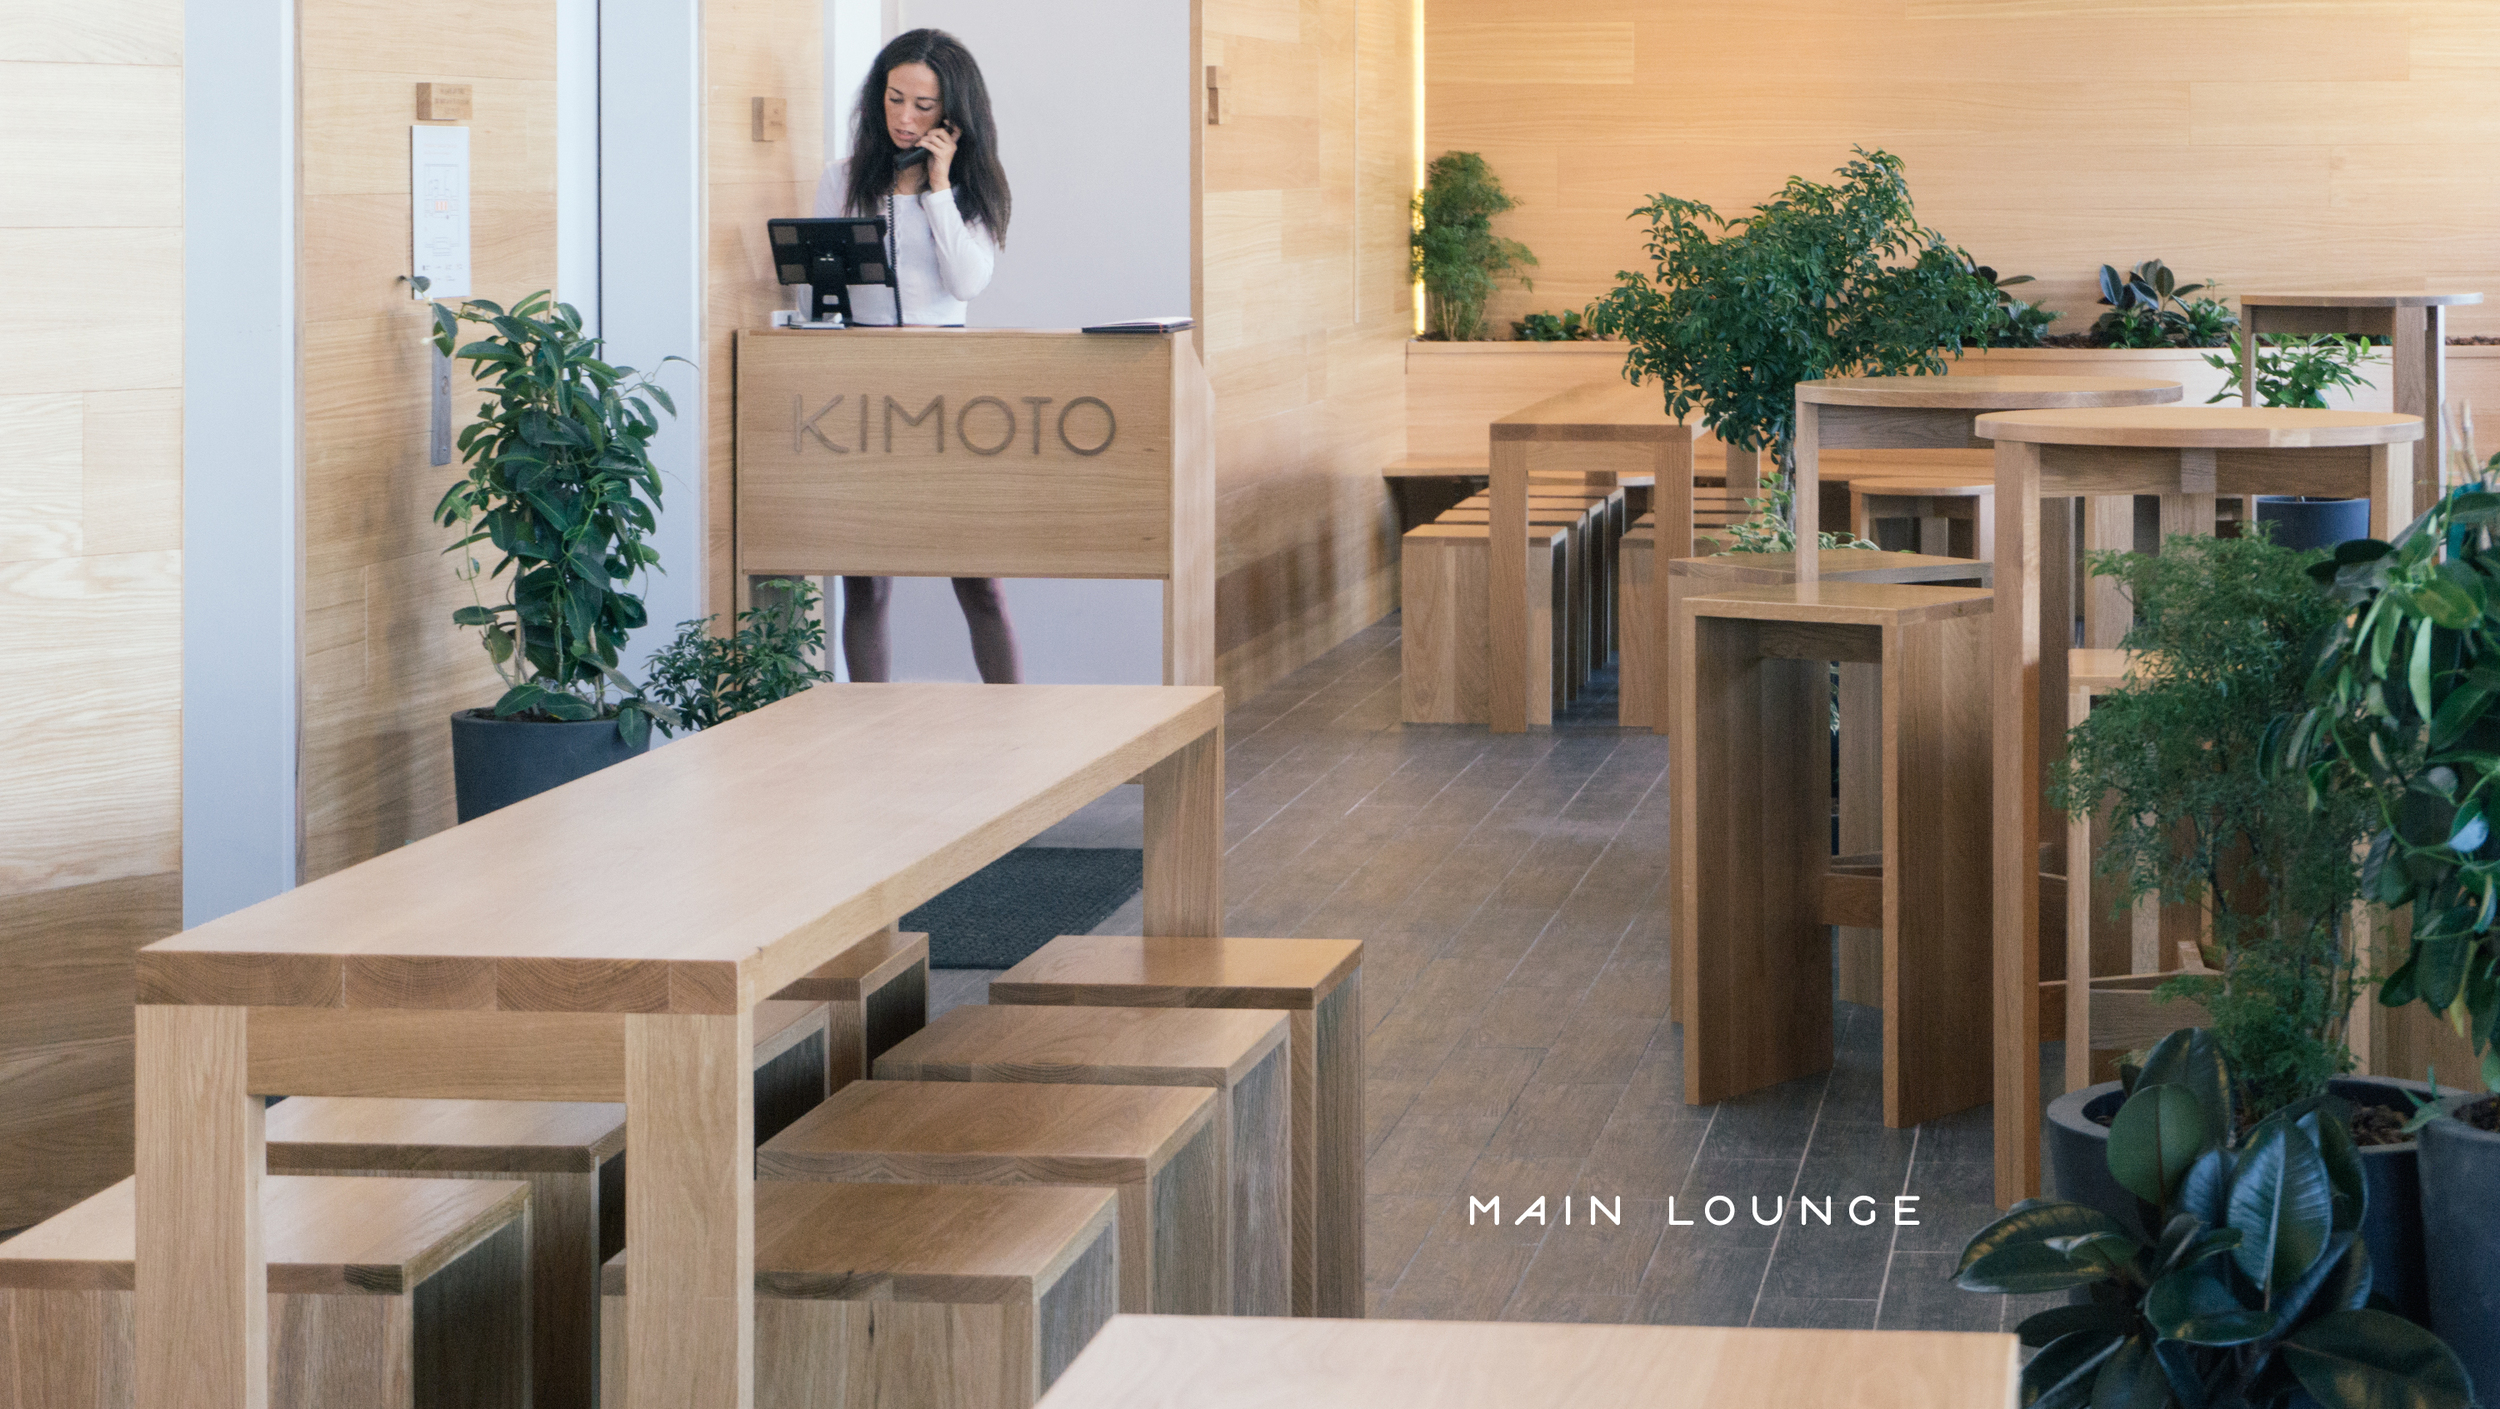 Kimoto Main Lounge